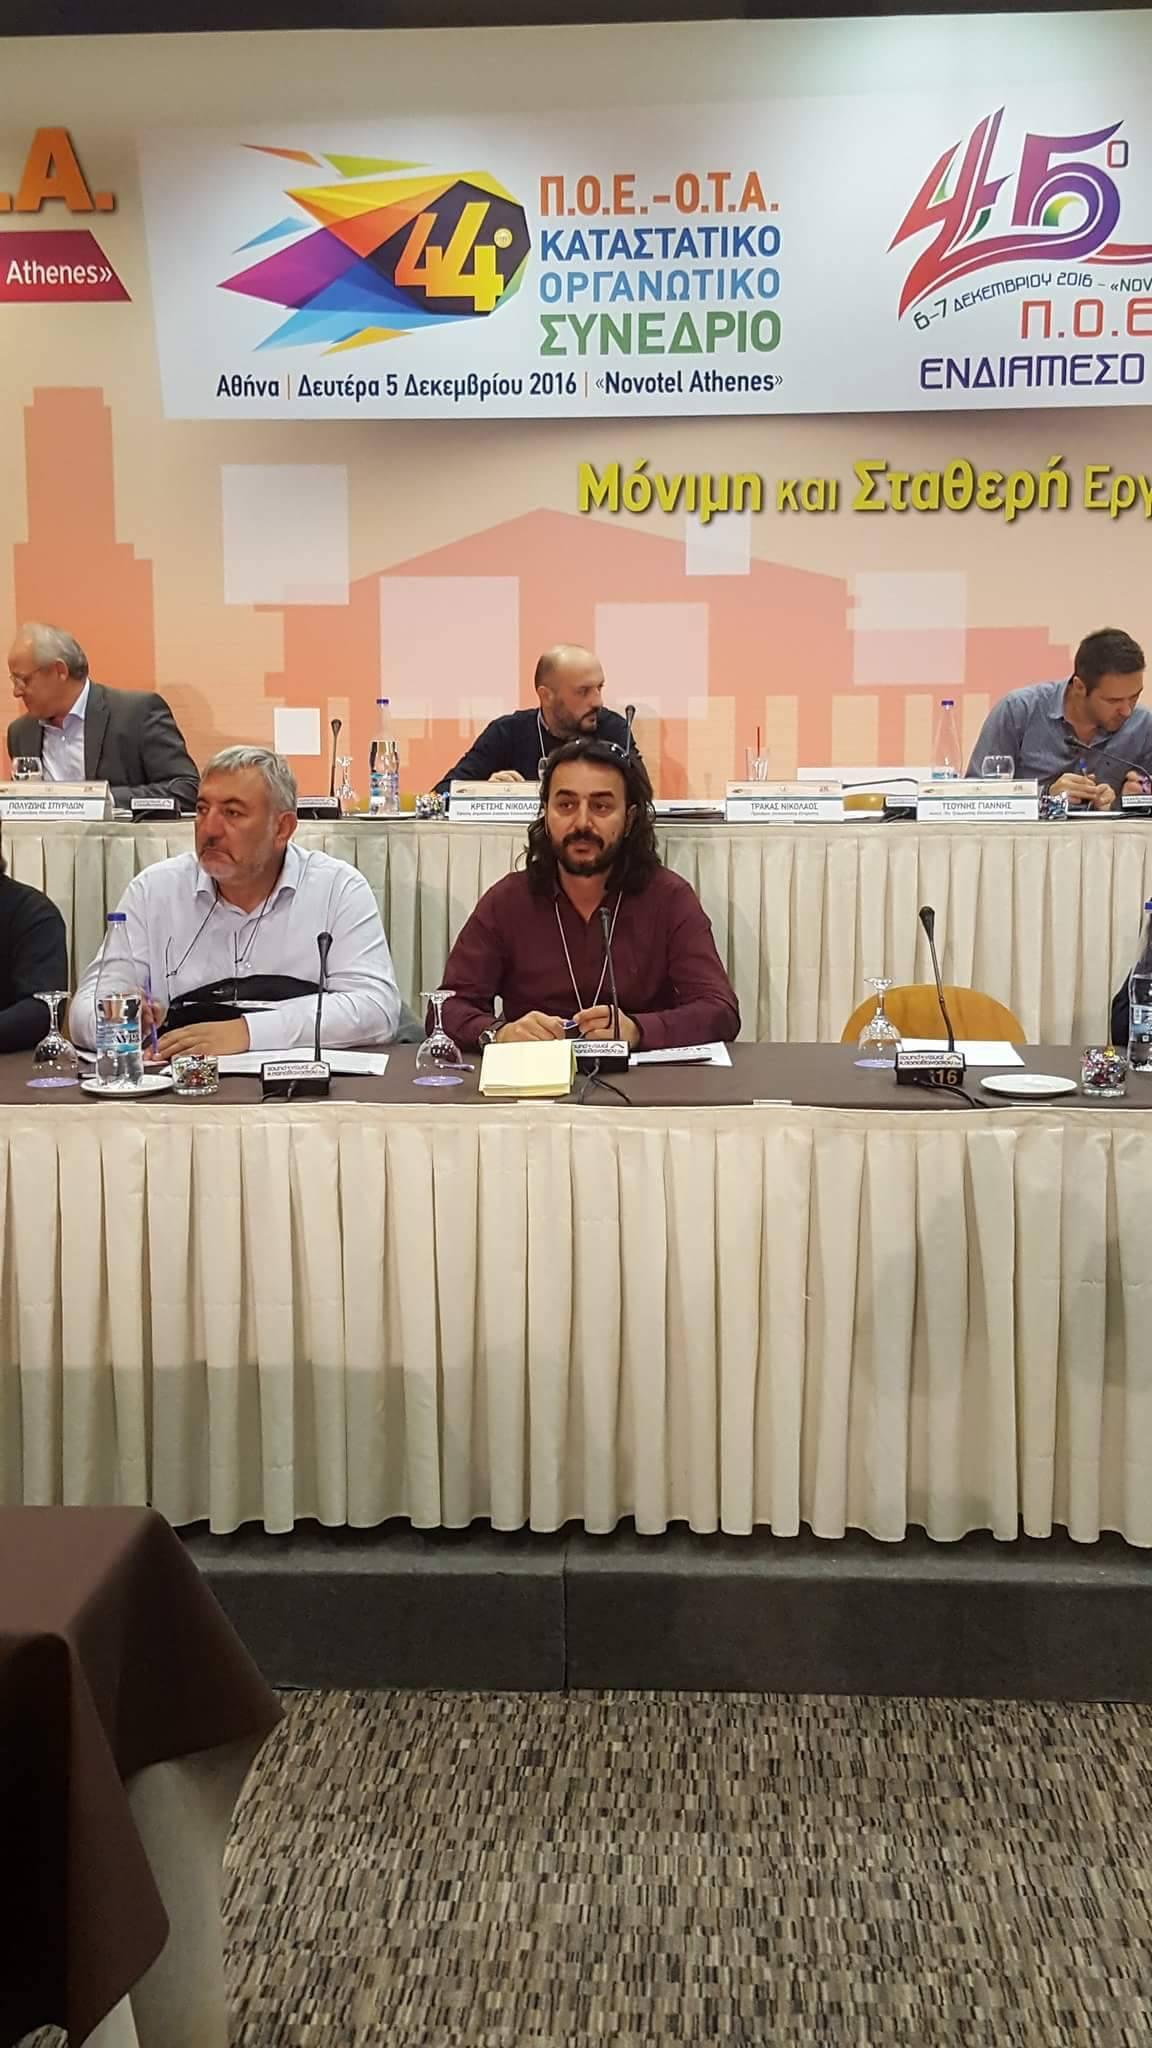 kozan.gr:  Προεδρεύων στο 45ο Συνέδριο της ΠΟΕ-ΟΤΑ ο Γ. Χριστοφορίδης